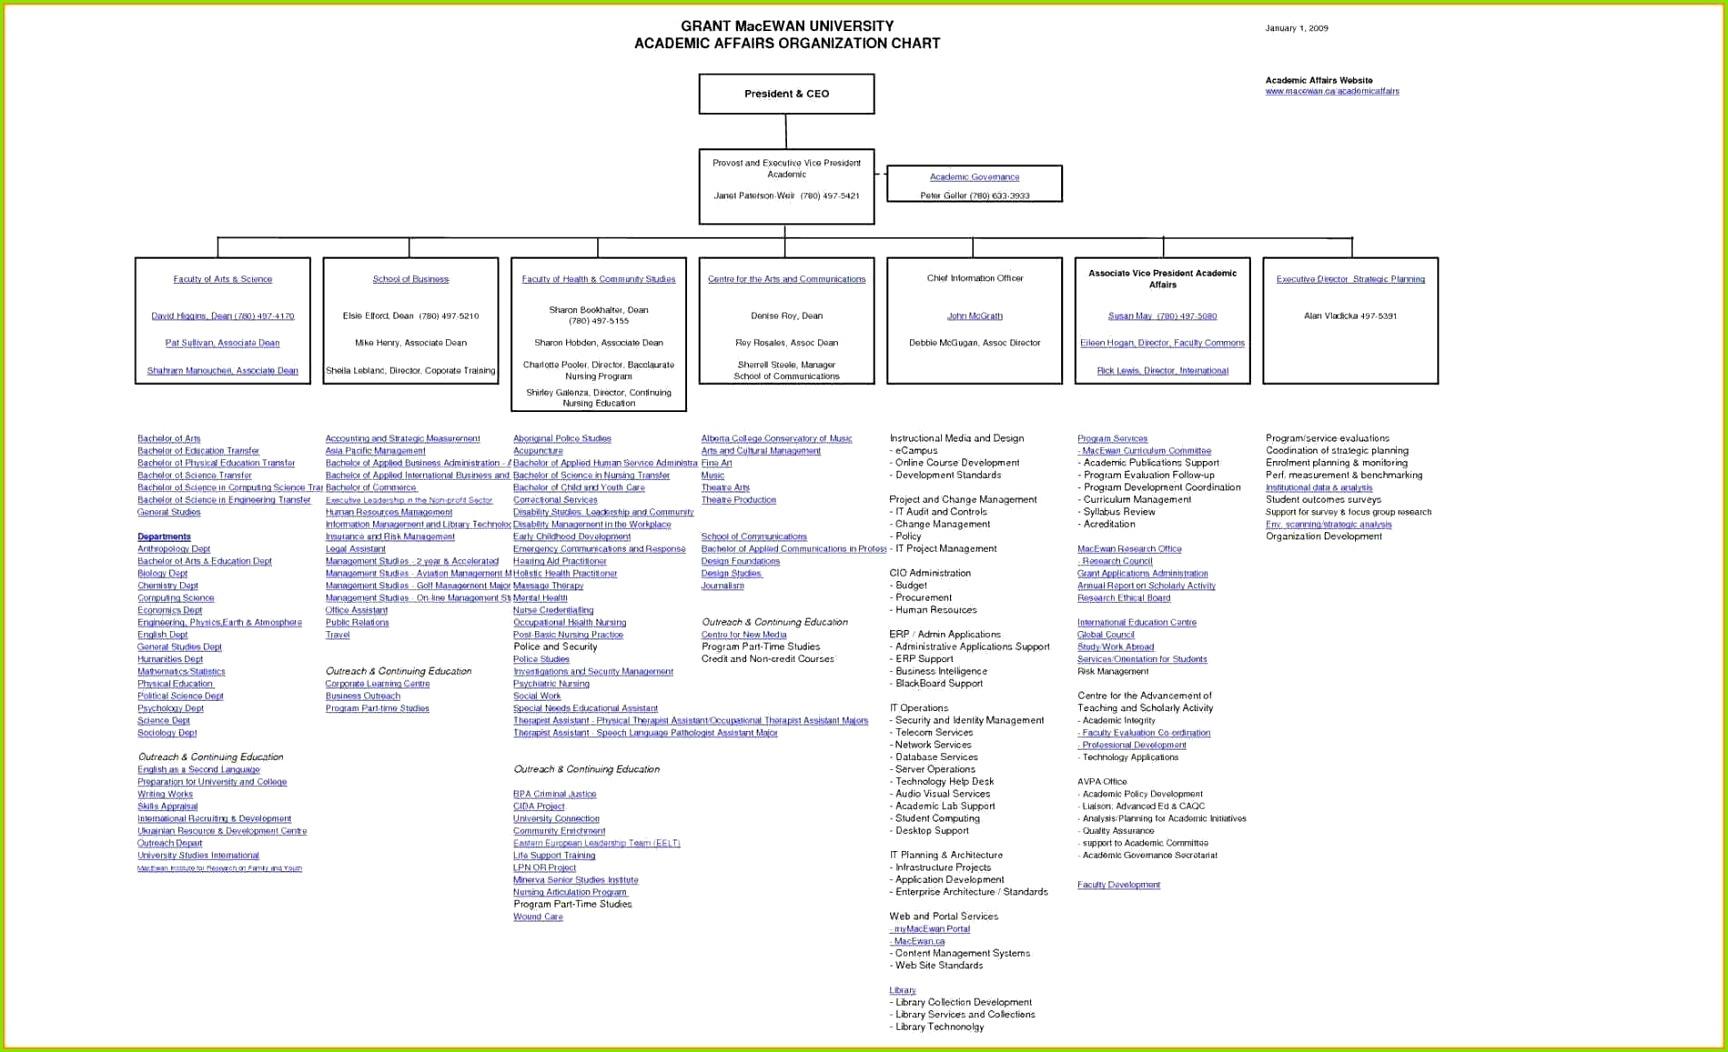 Organization Chart Template Excel Elegant Blank Flow Chart Template for Word Unique Template Map Printable Od